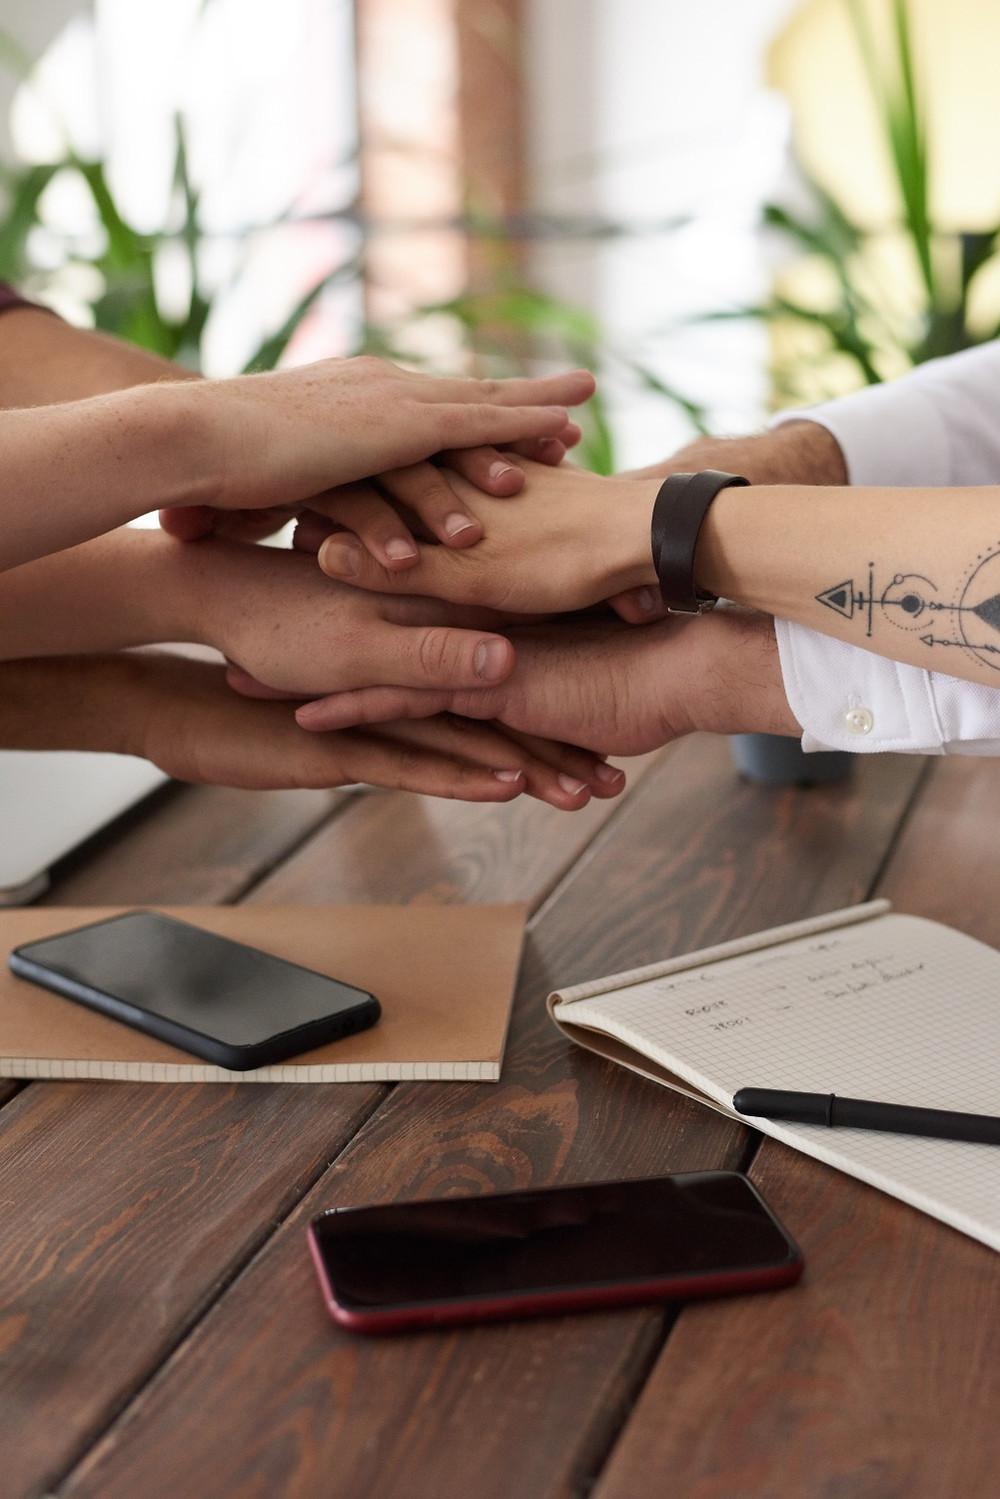 Collaborative / sharing economy